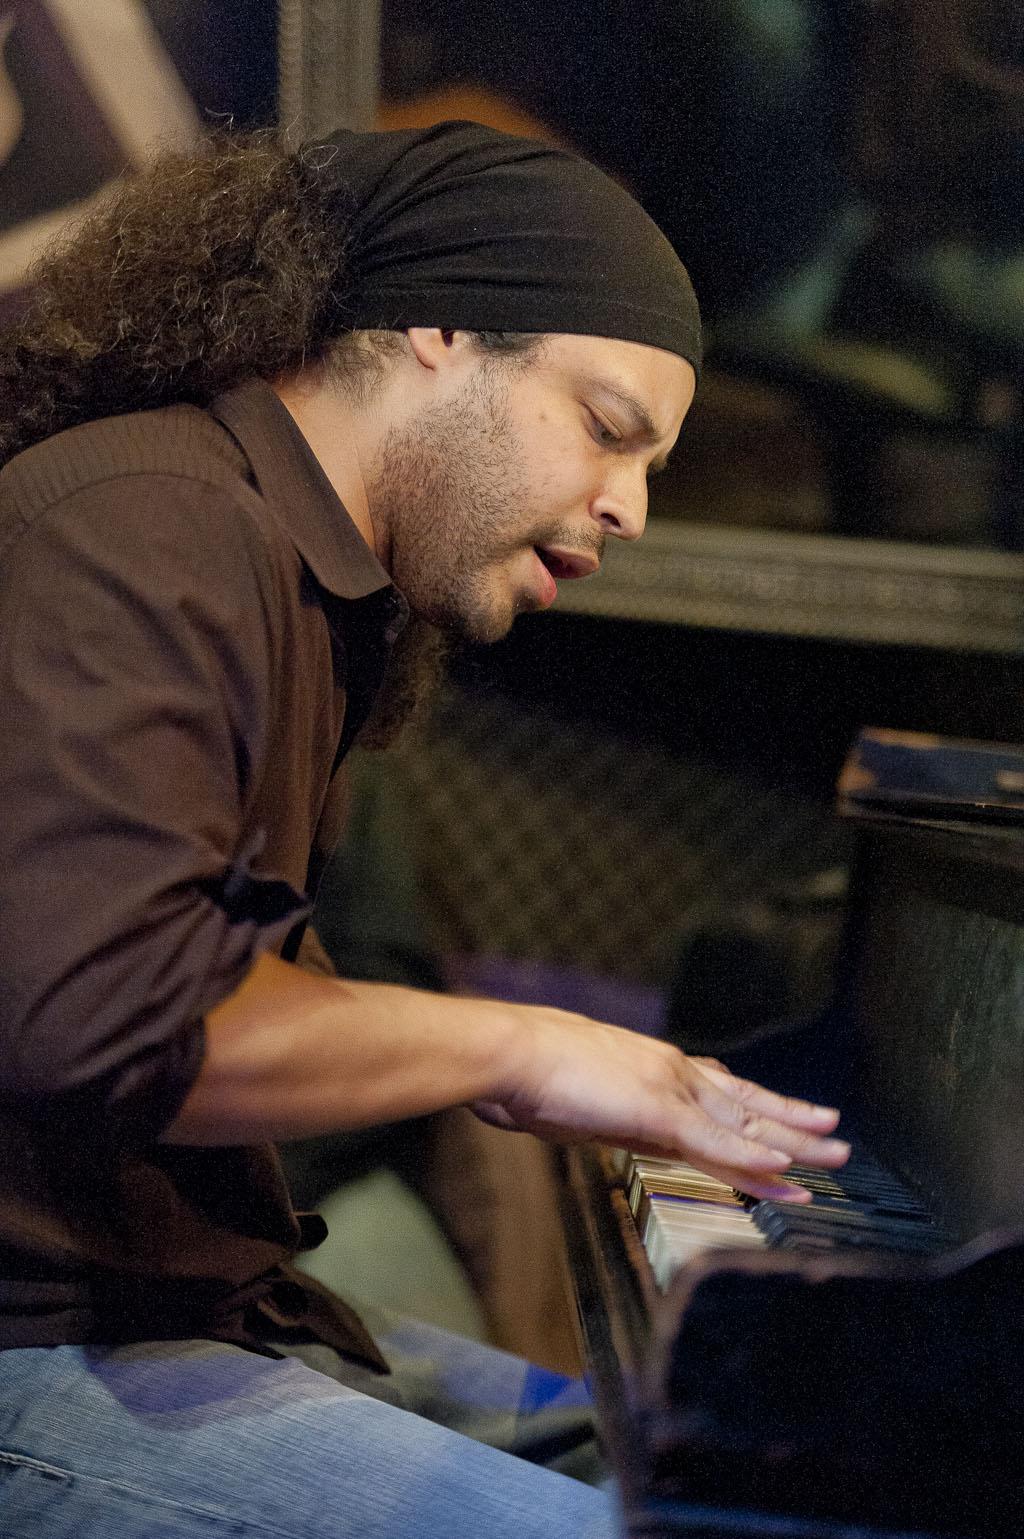 Duane eubanks quartet live at smalls nyc 5/16/13